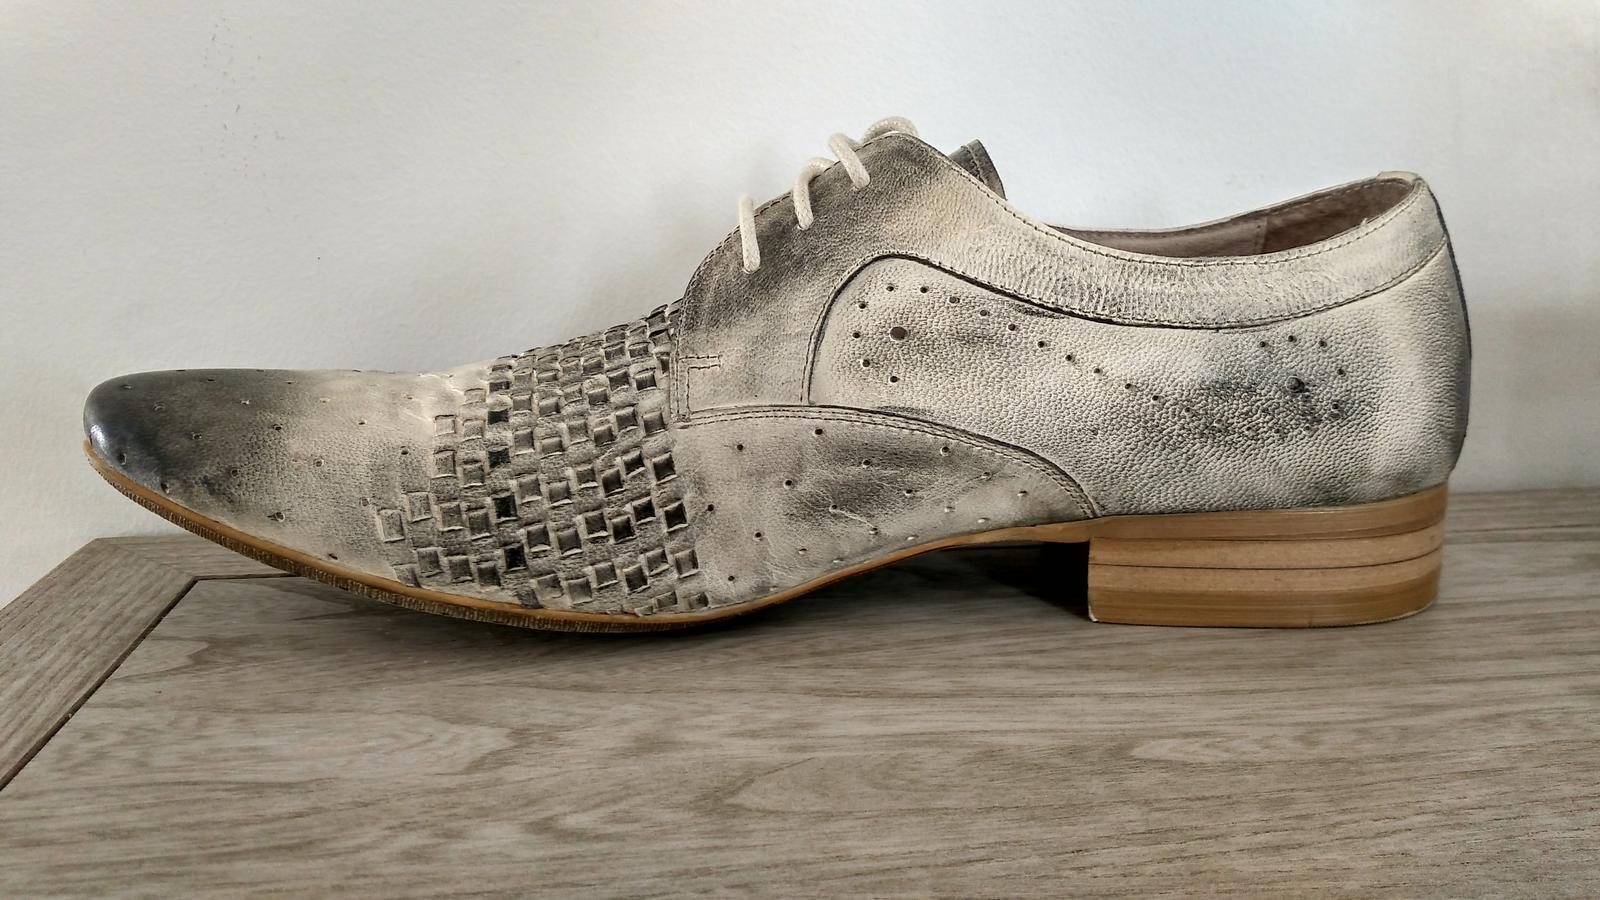 Pánske spoločenské topánky - Obrázok č. 2